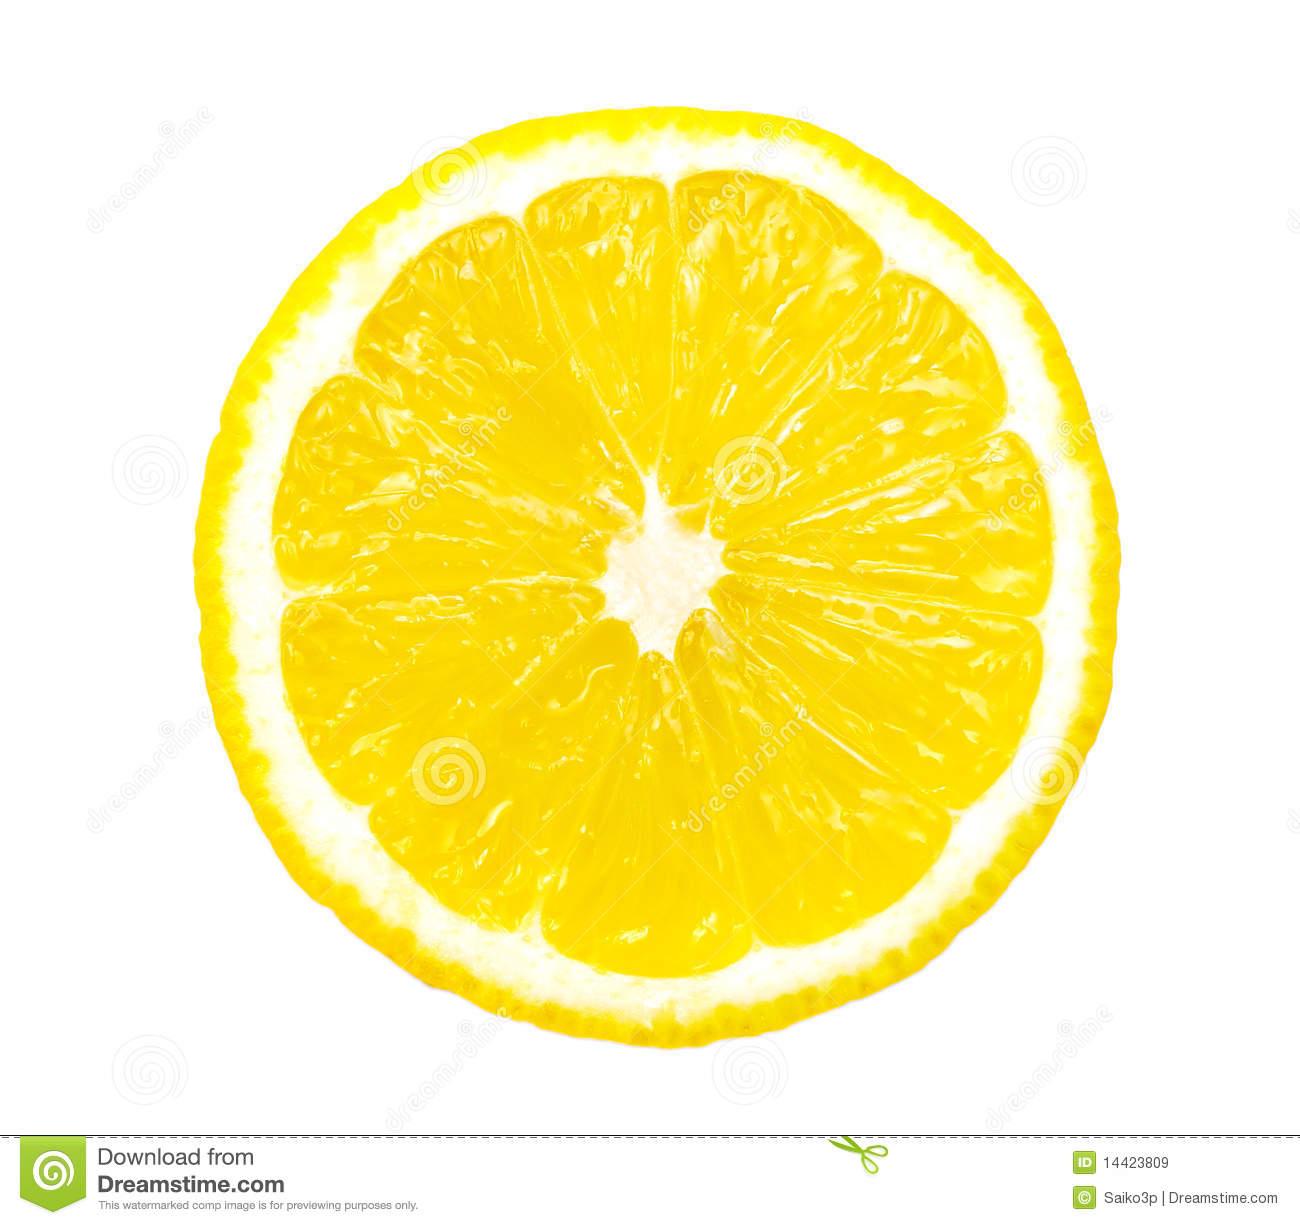 Free PNG Lemon Slice